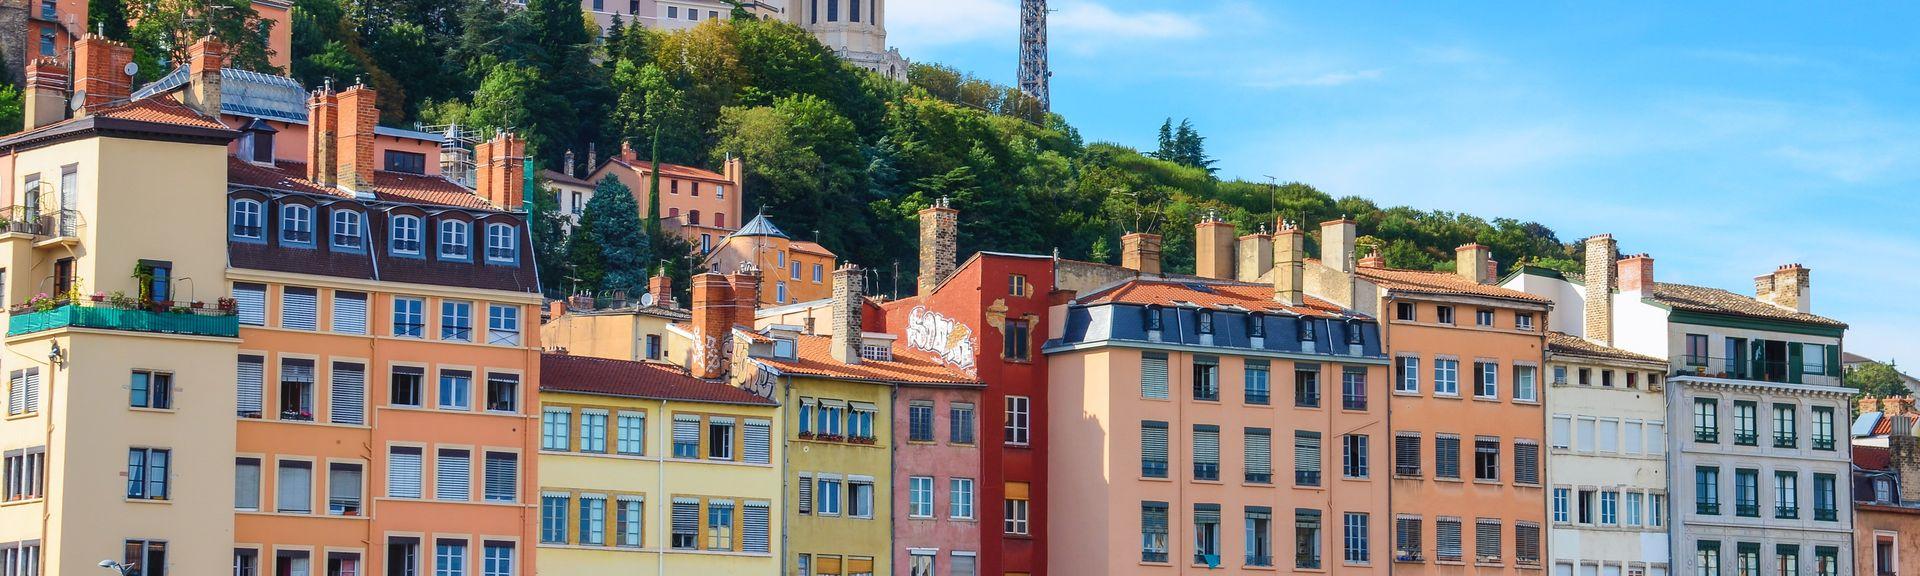 Auvergne-Rhône-Alpes, France